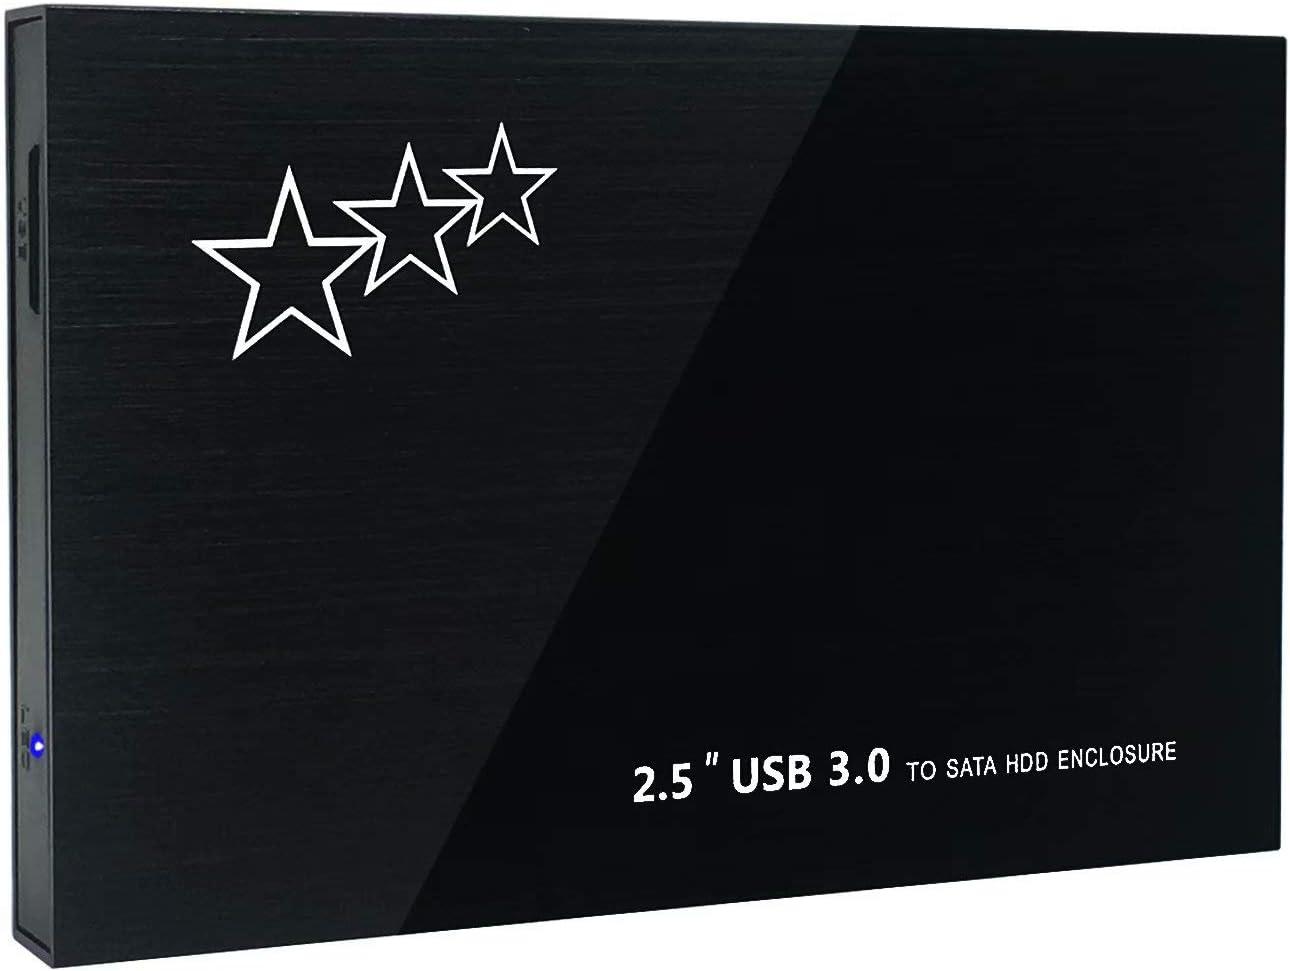 1TB External Hard Drive Portable - HWAYO 2.5'' Ultra Slim HDD Storage USB 3.0 for PC, Laptop, Mac, Chromebook, Xbox One